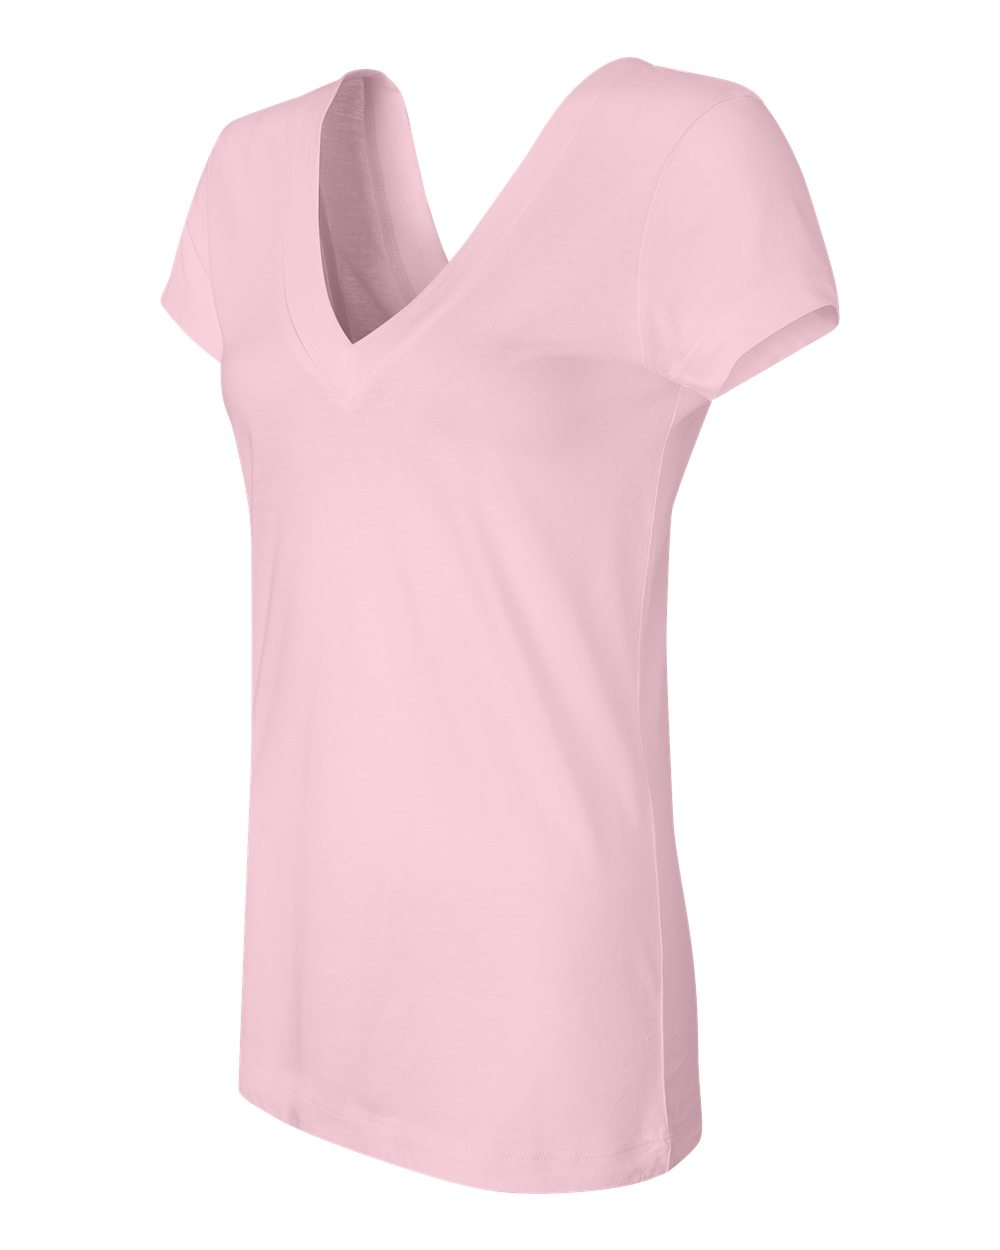 Bella 8410 Soft Pink